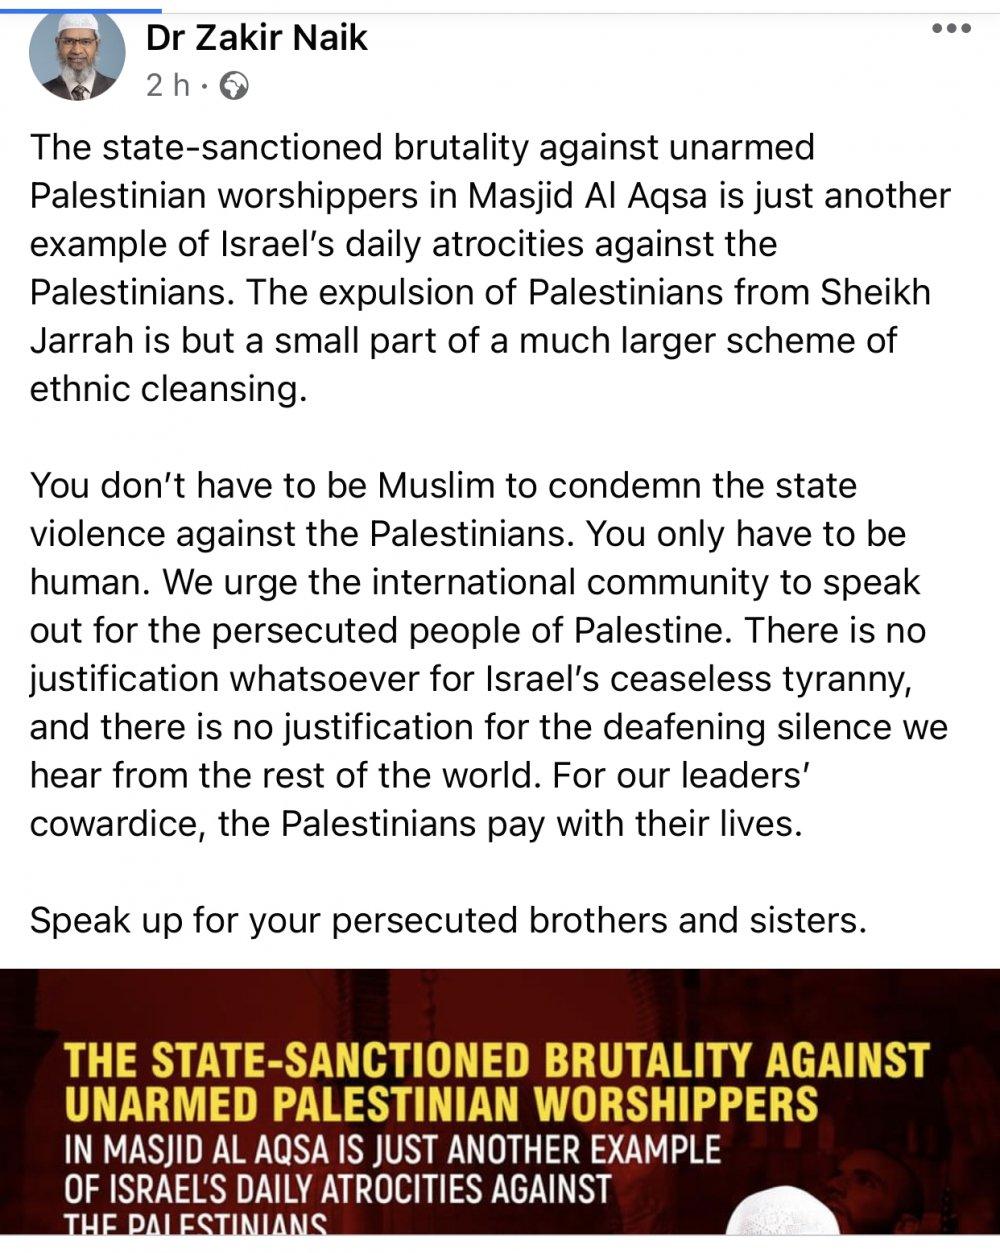 Israel, Palestine, Al Aqsa under attack